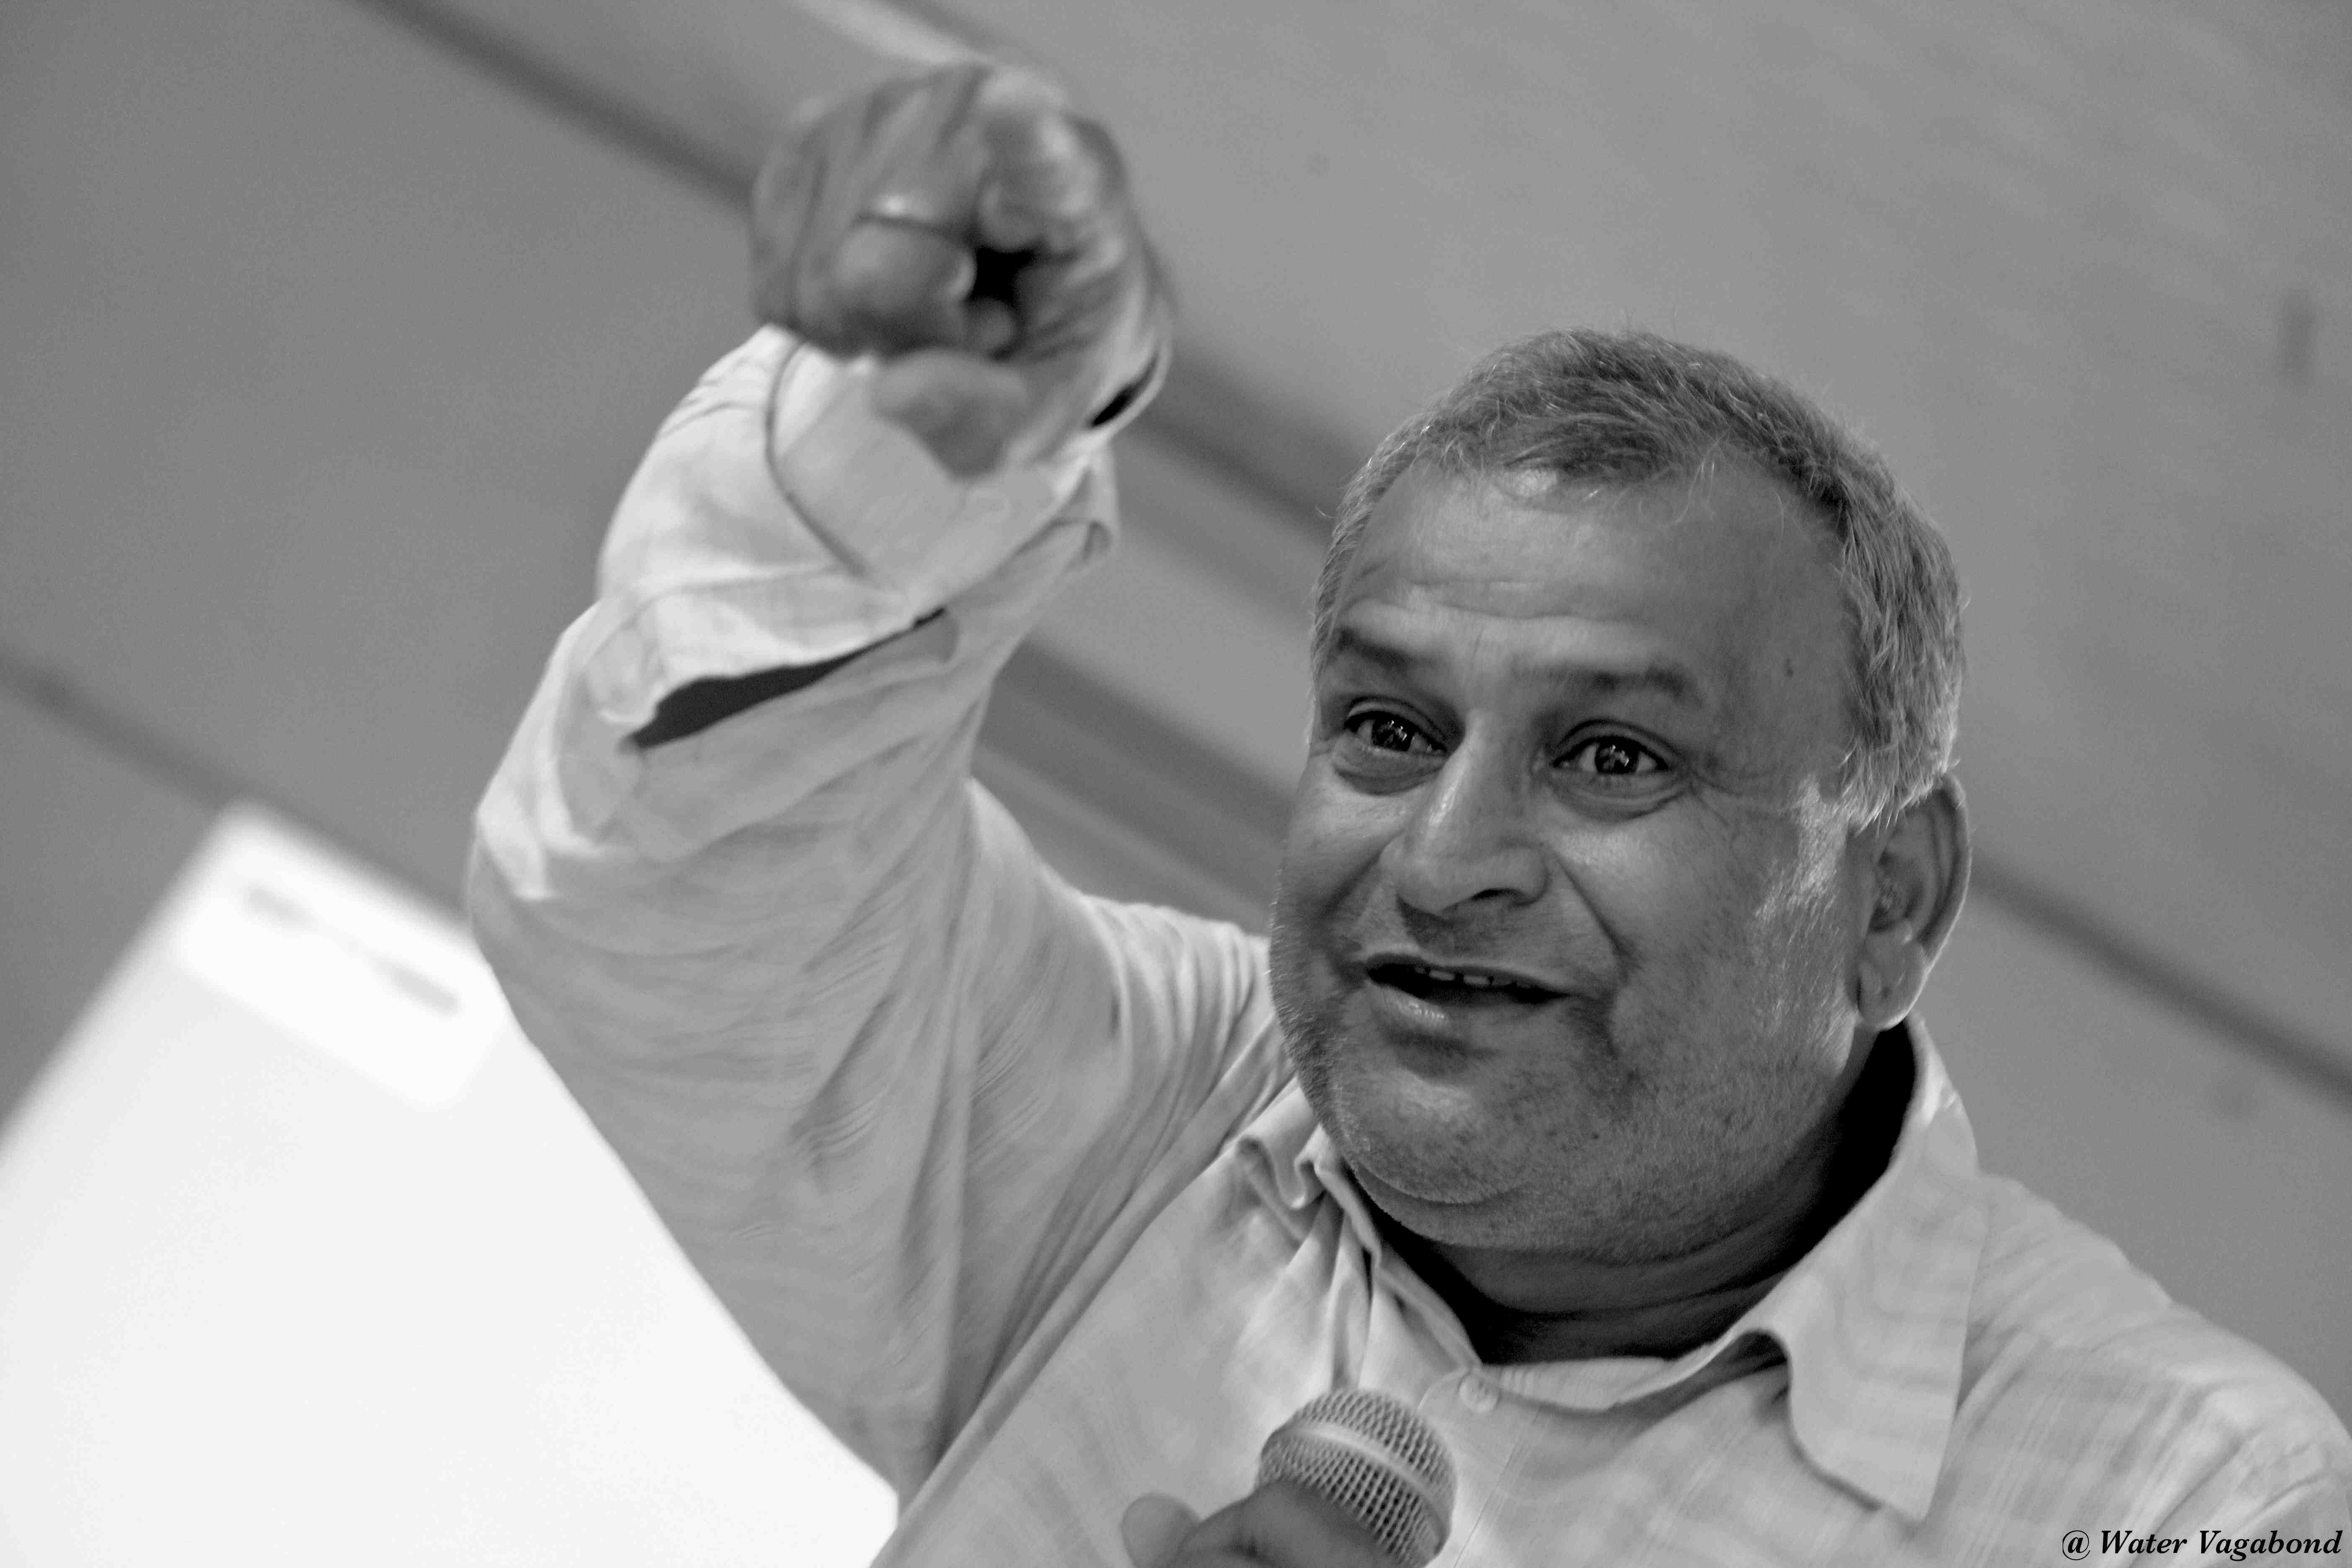 Activist Shashi Shekhar Speaking at a workshop in Patna